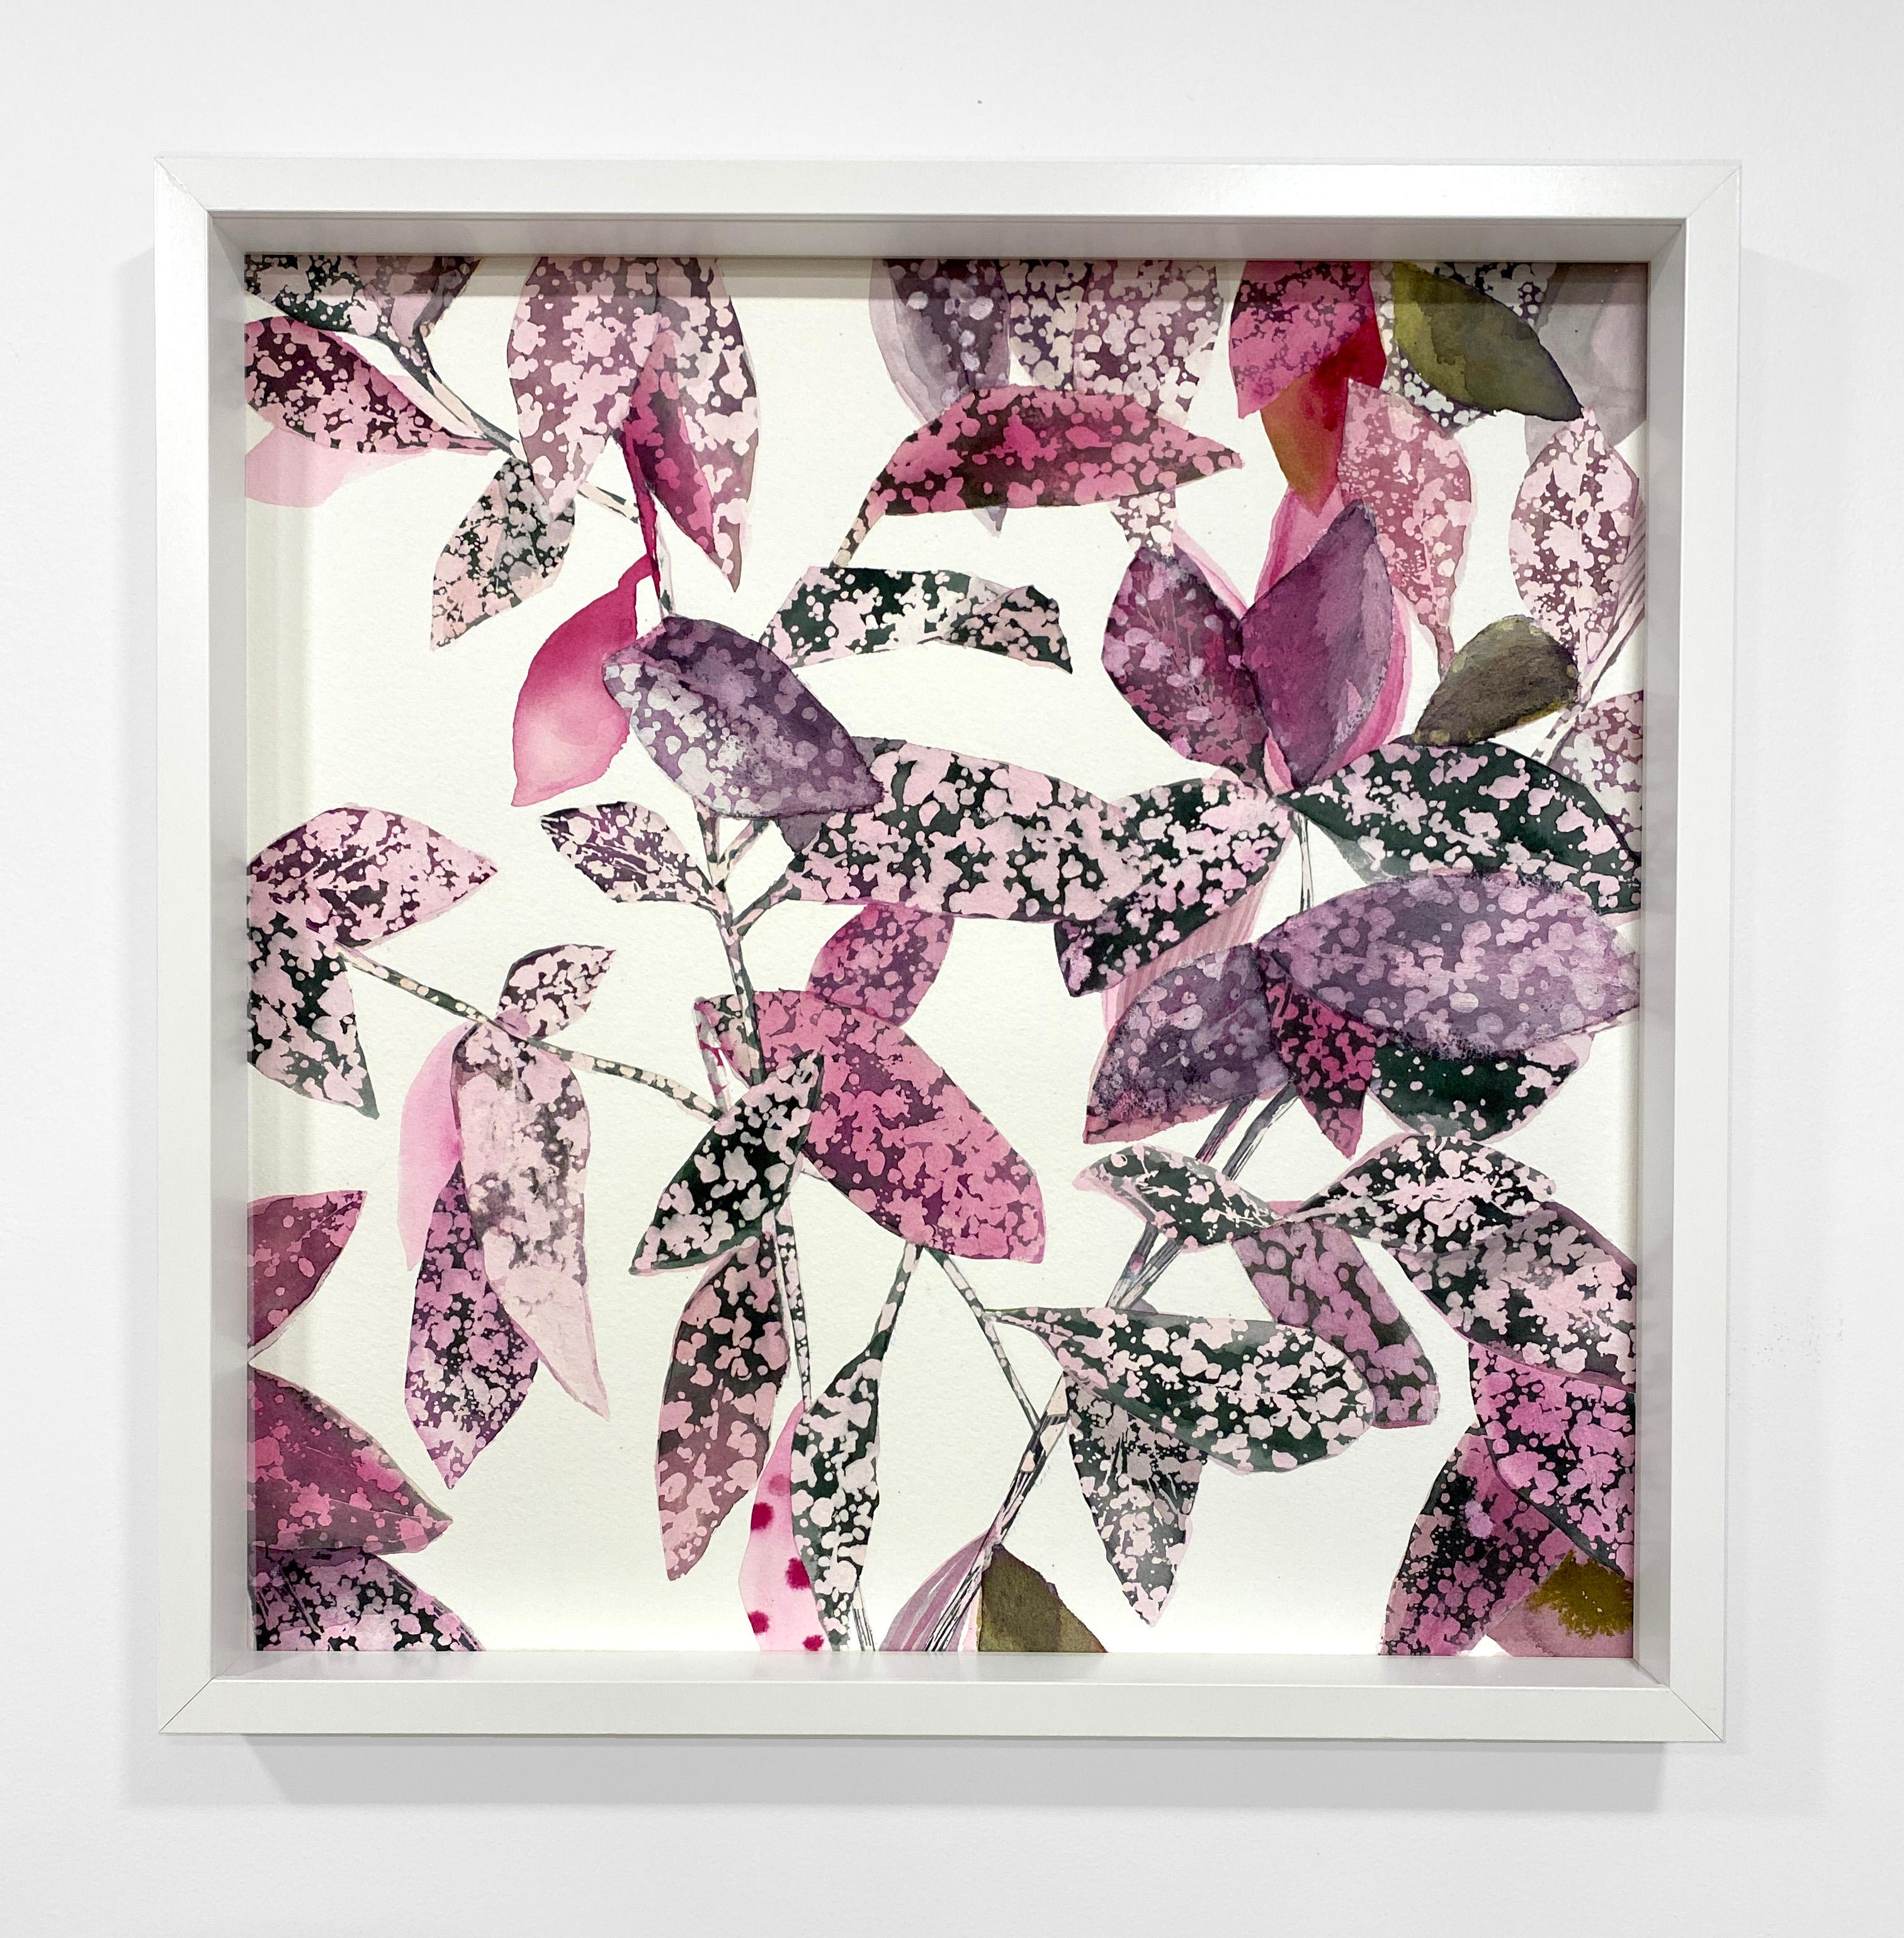 Framed Square Botanical Watercolor by Rachel Kohn - Pink Splash Plant